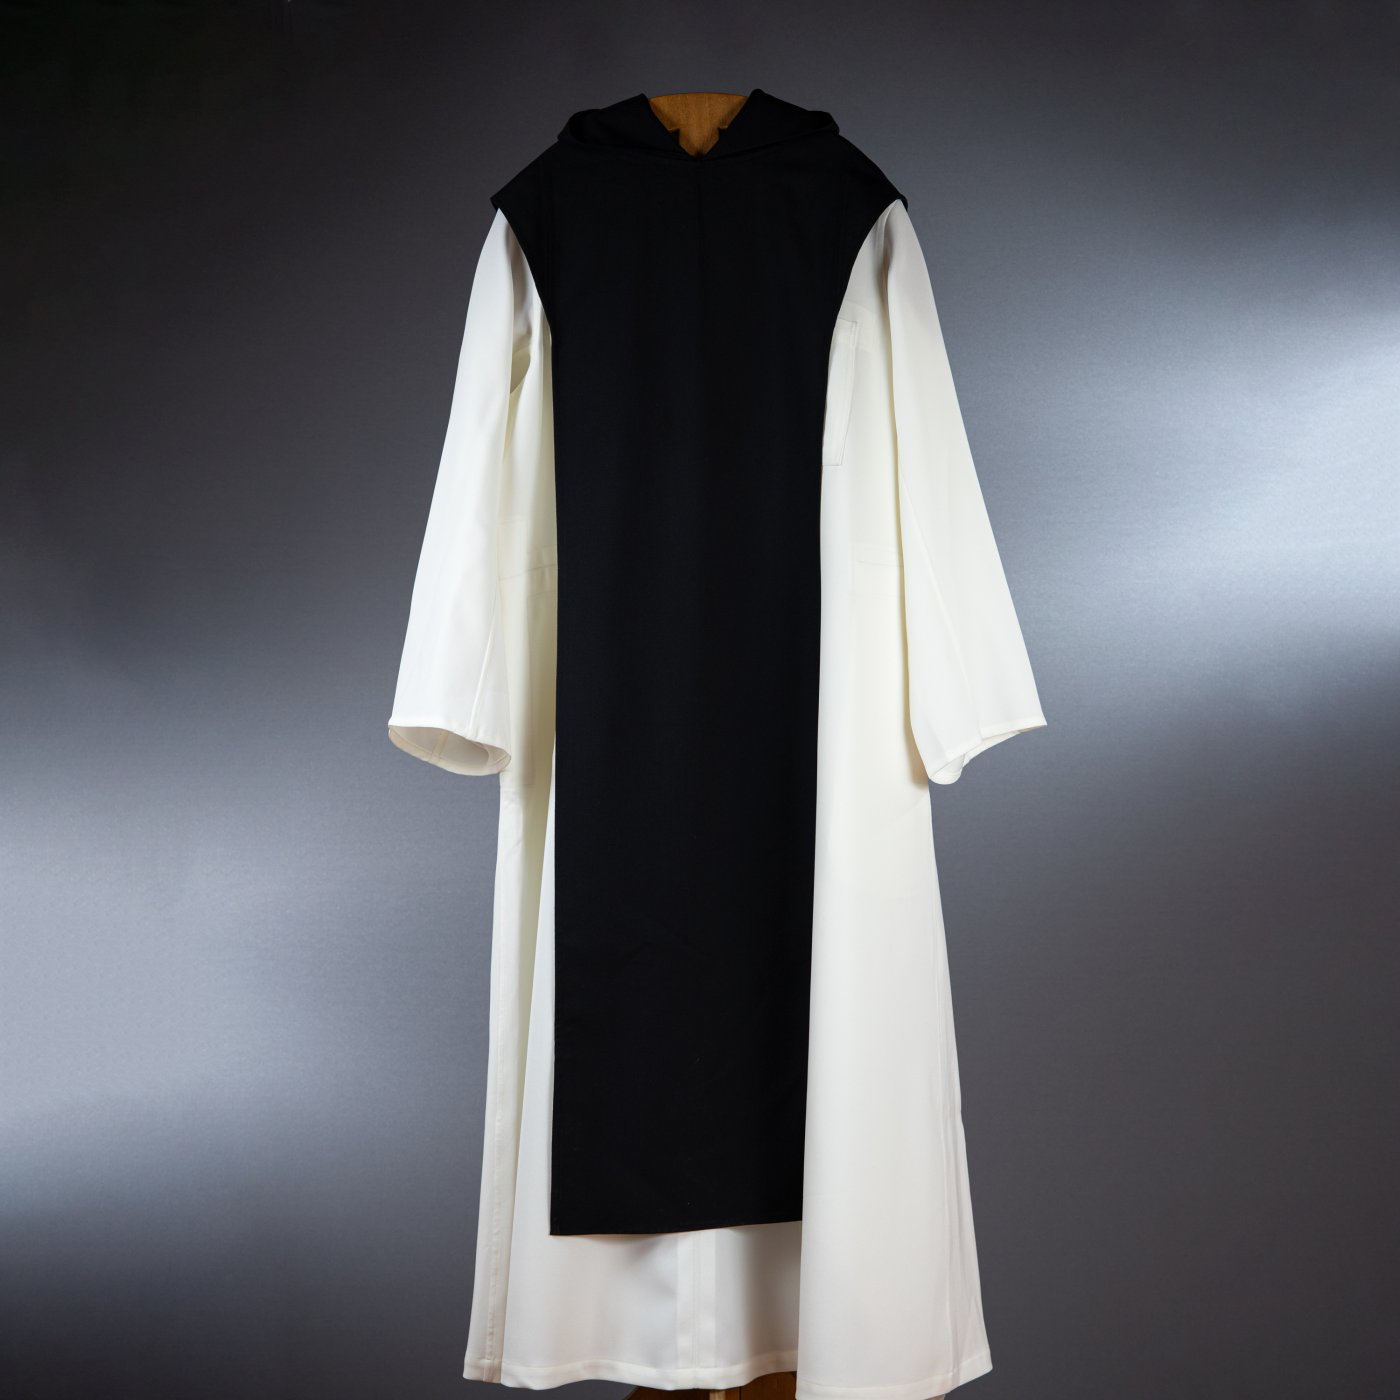 Robe et scapulaire